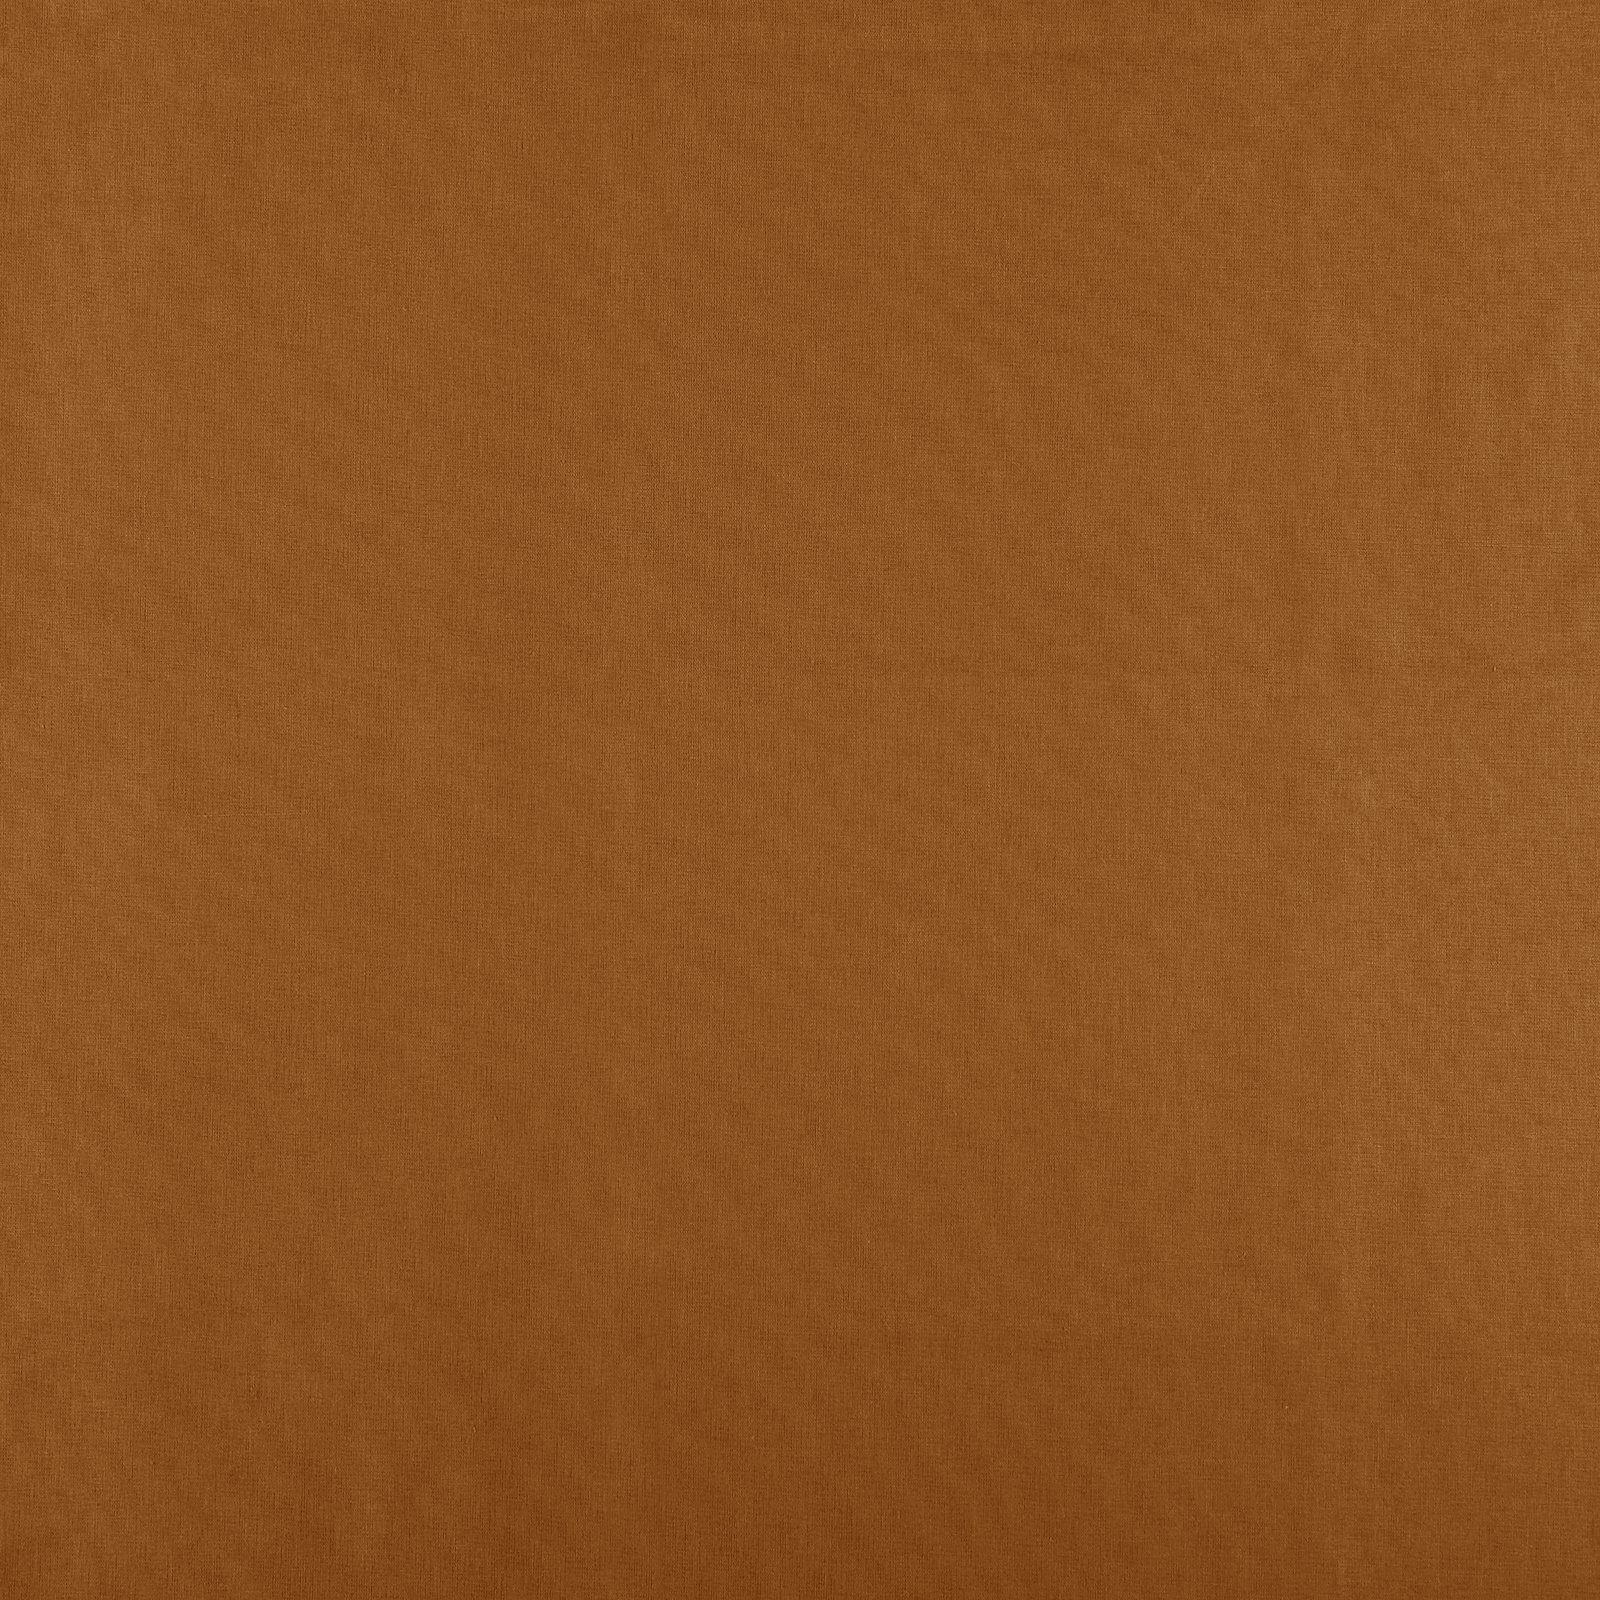 Linen/cotton golden brown 410128_pack_solid